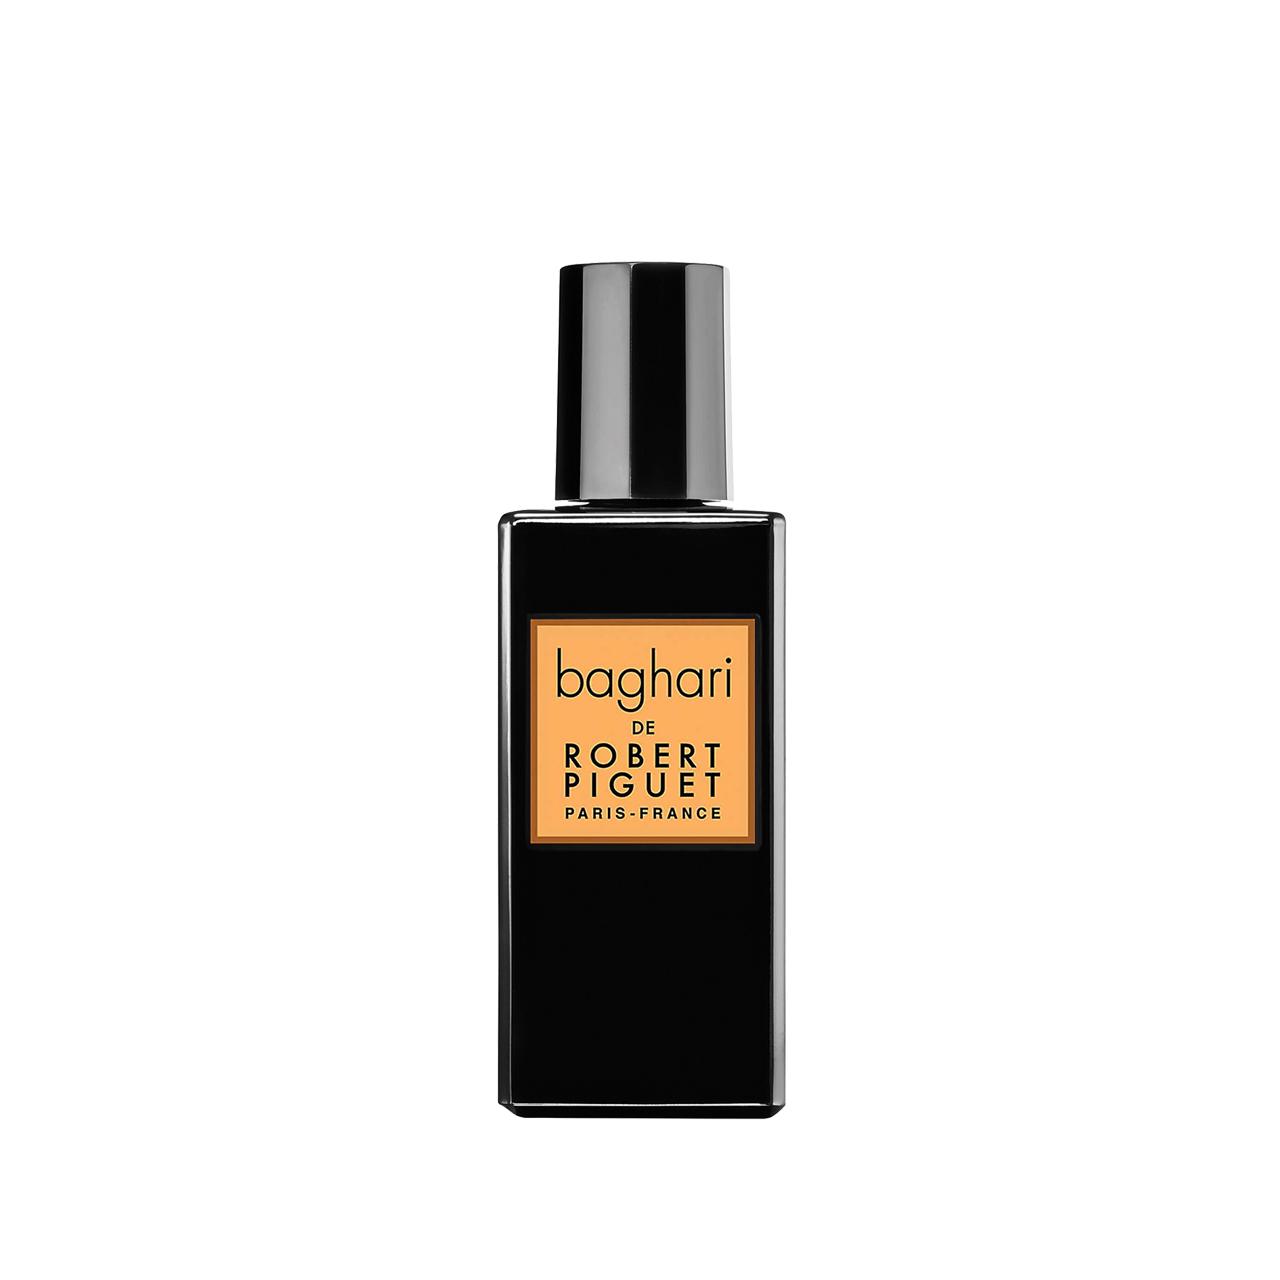 Baghari - Eau de Parfum